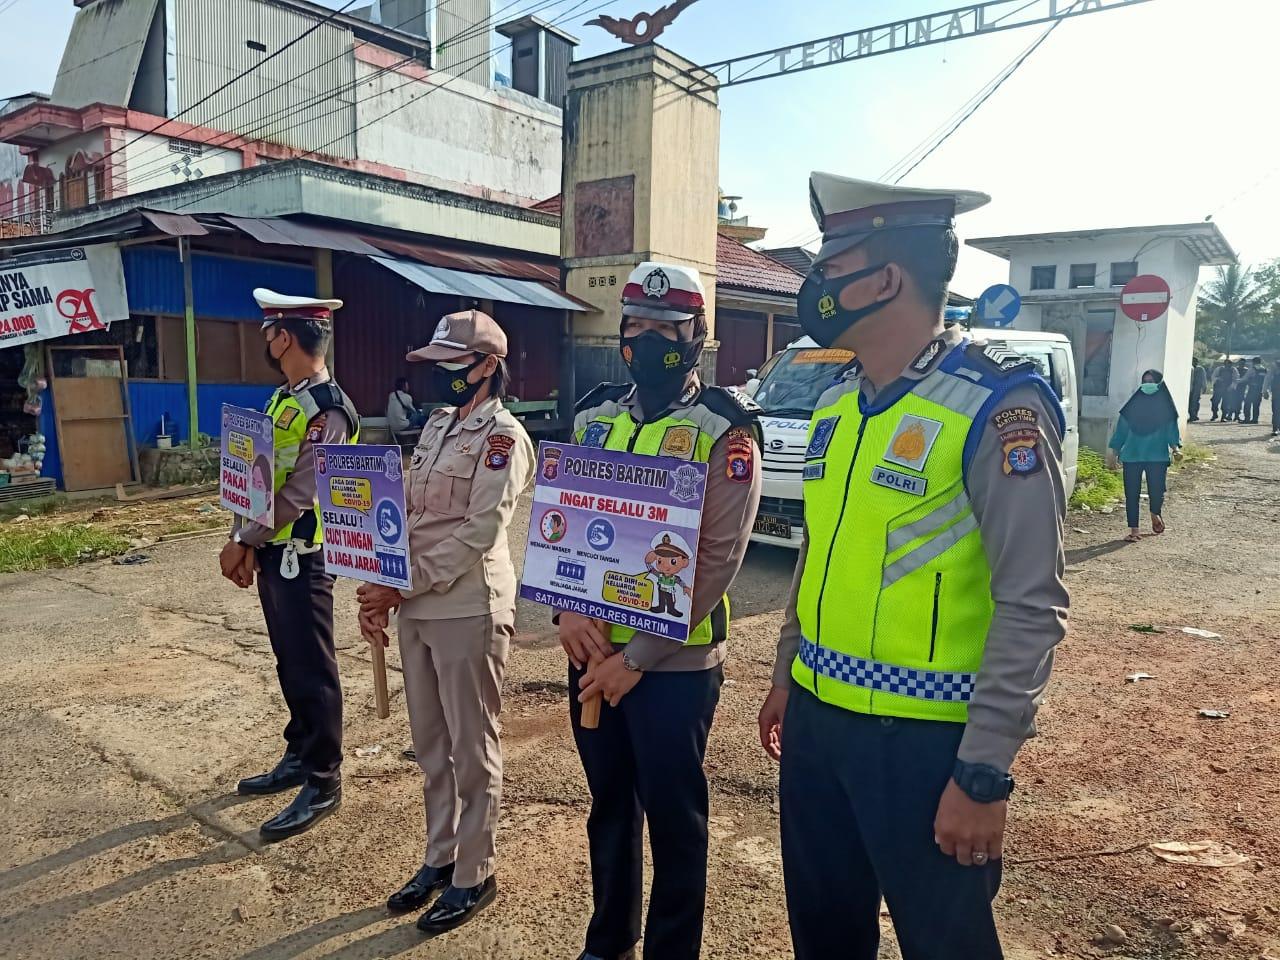 Satlantas Polres Bartim Gencar (Gatur) Kampanyekan Ayo Pake Masker